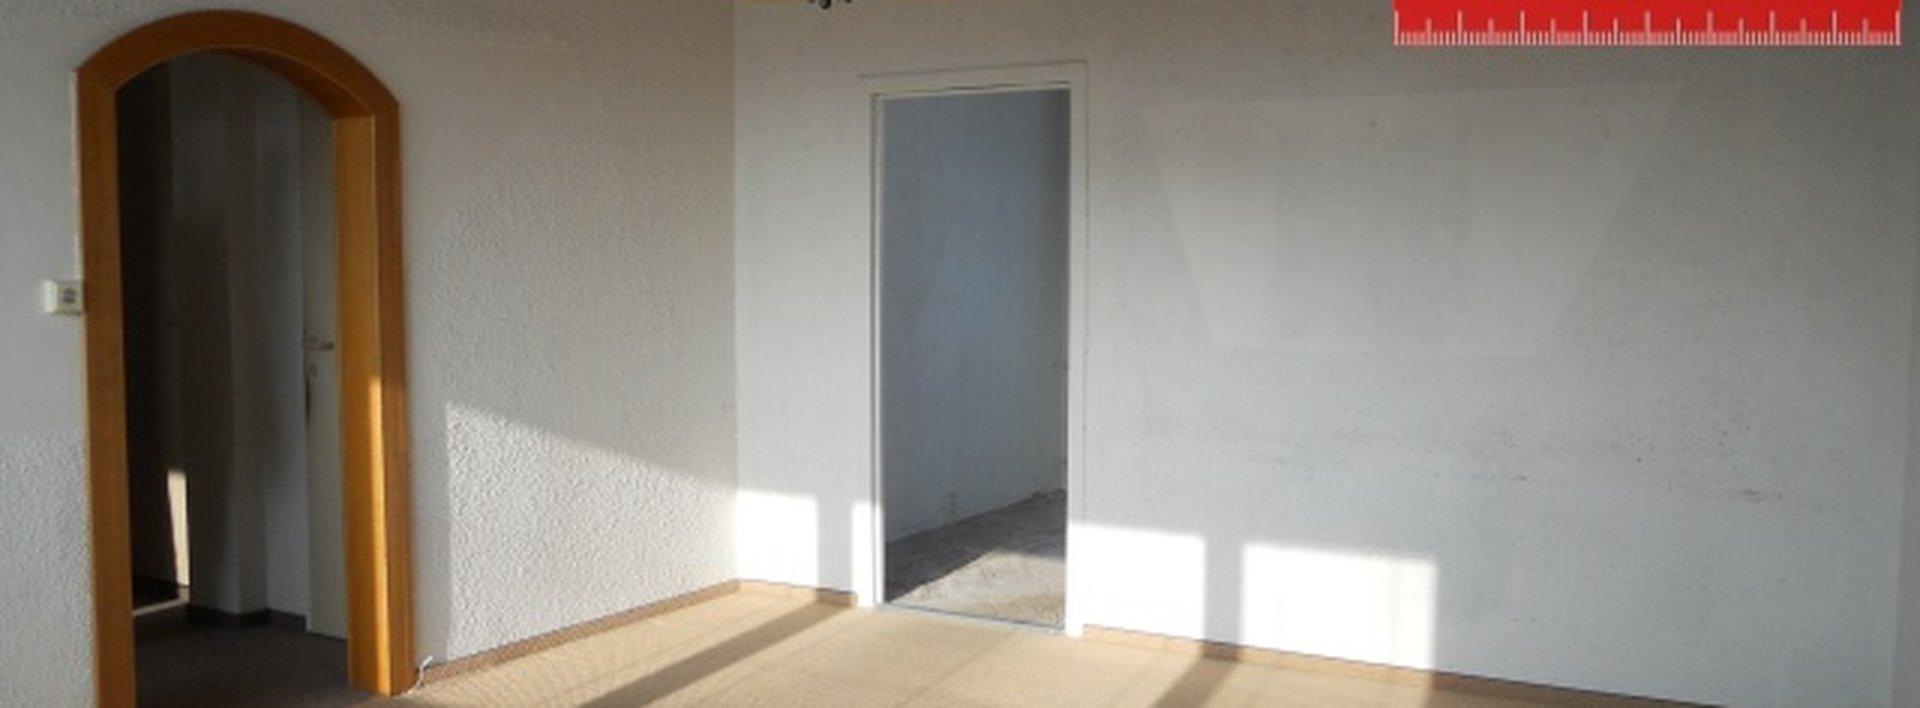 Slunný byt 3+1+L, 72m2, OV, s nádhernými výhledy, JBC - Mšeno n. Nisou, Ev.č.: N46055